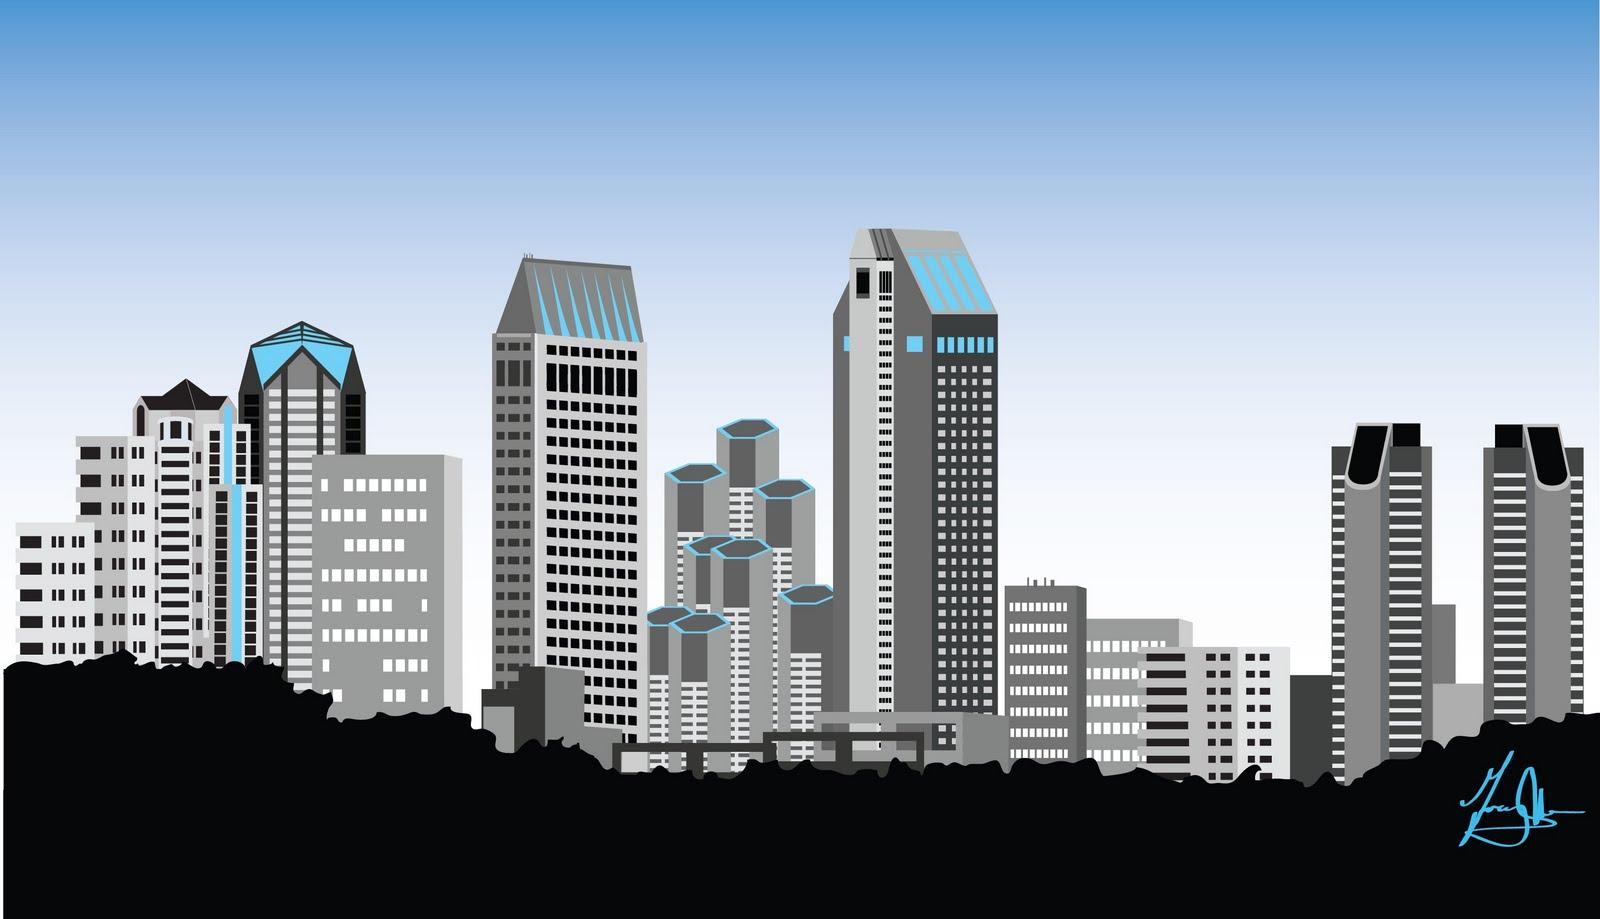 my city the san diego skyline